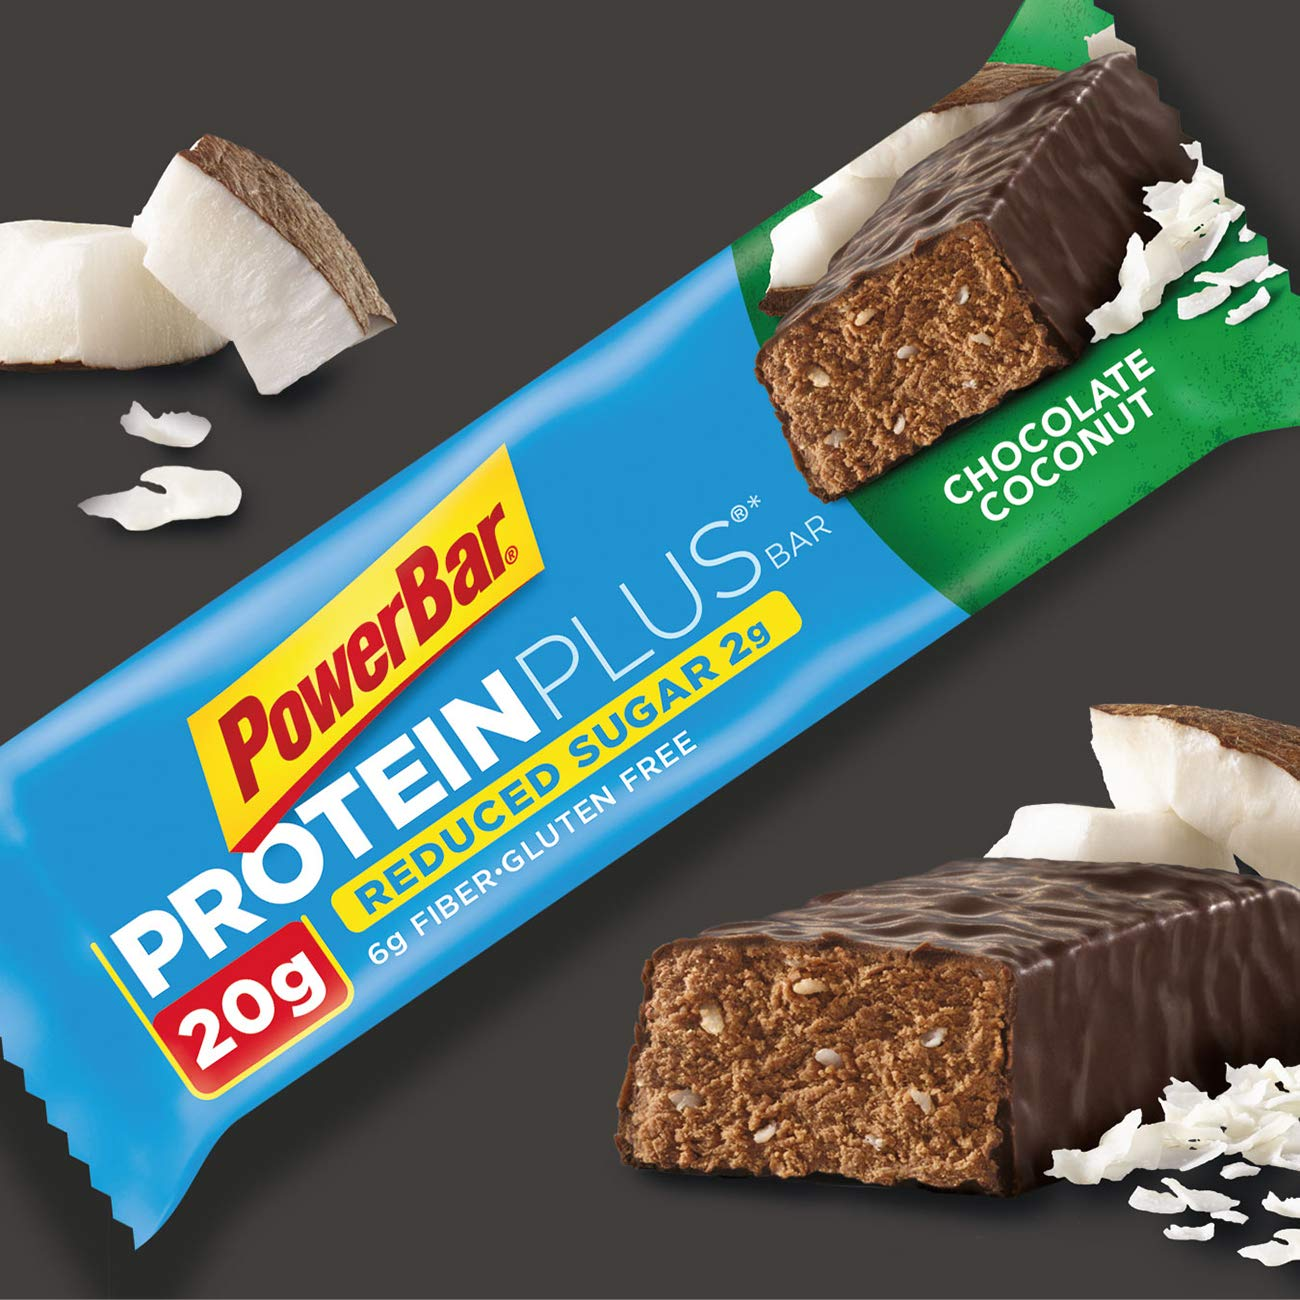 Amazon.com: PowerBar Protein Plus Reduced Sugar Bar, Chocolate ...